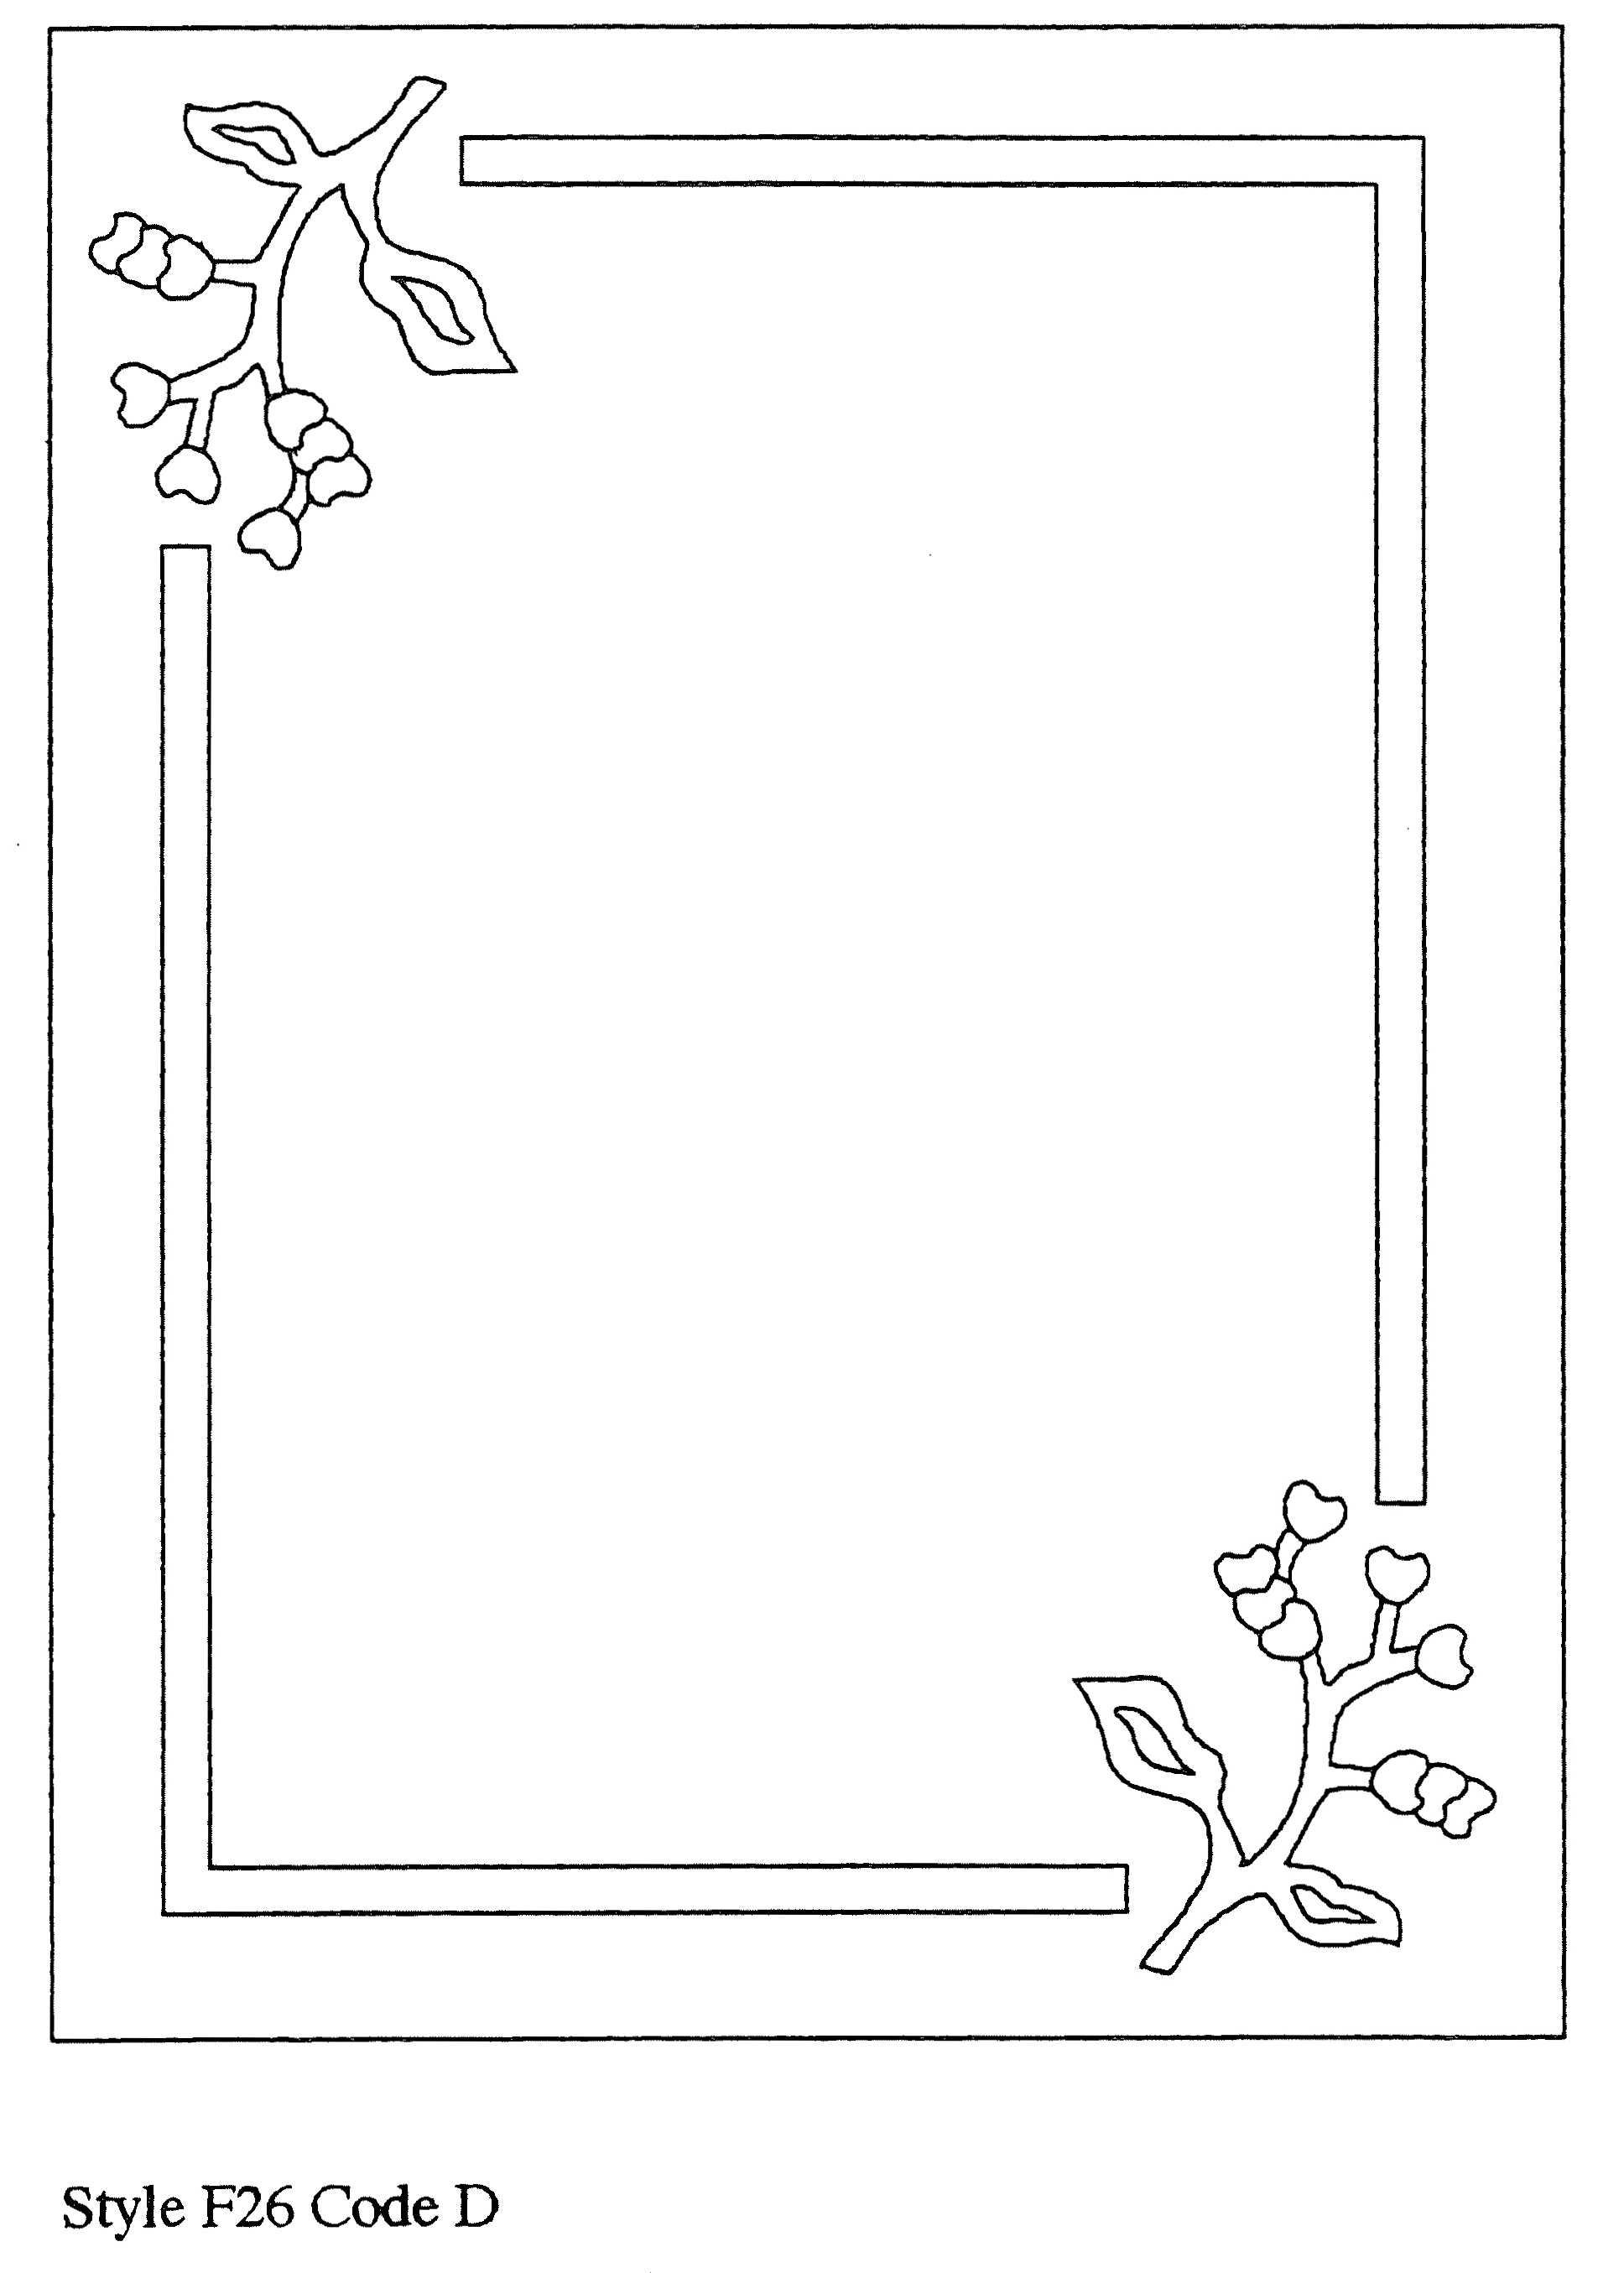 Page 3 copy 2.jpg